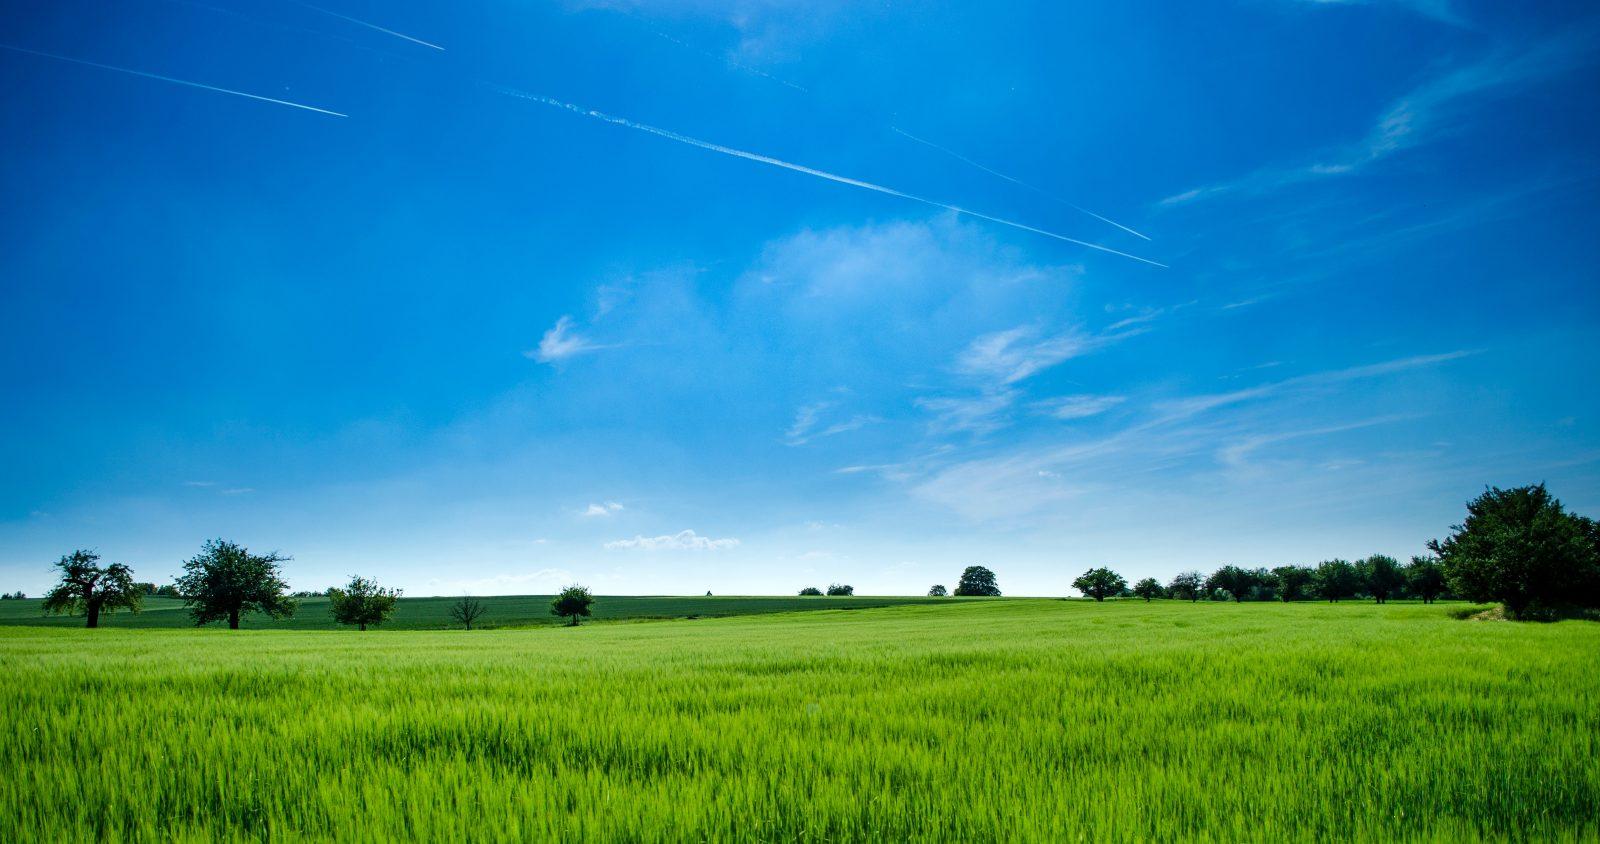 field of grass lawn mower